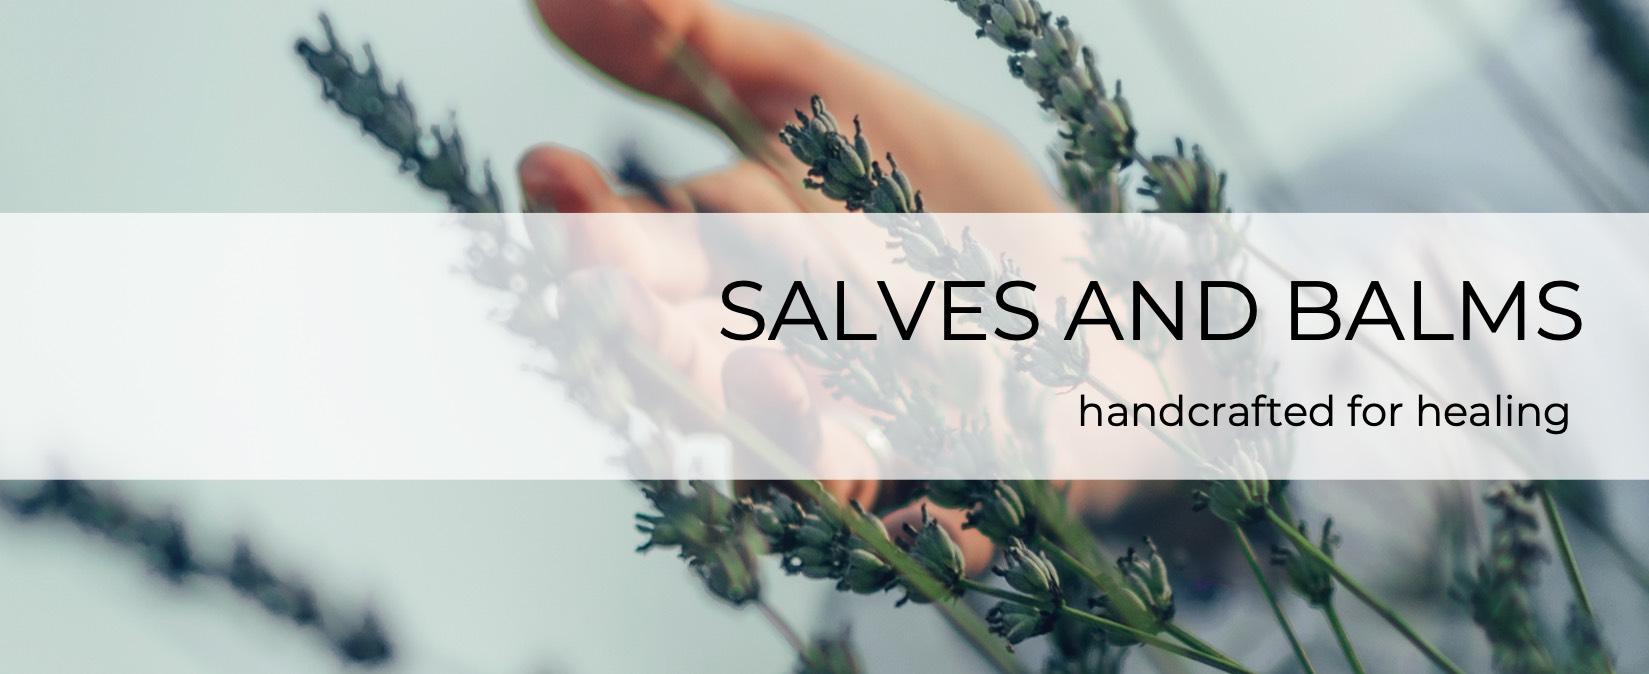 salves and balms jersey city nj salvation wellness